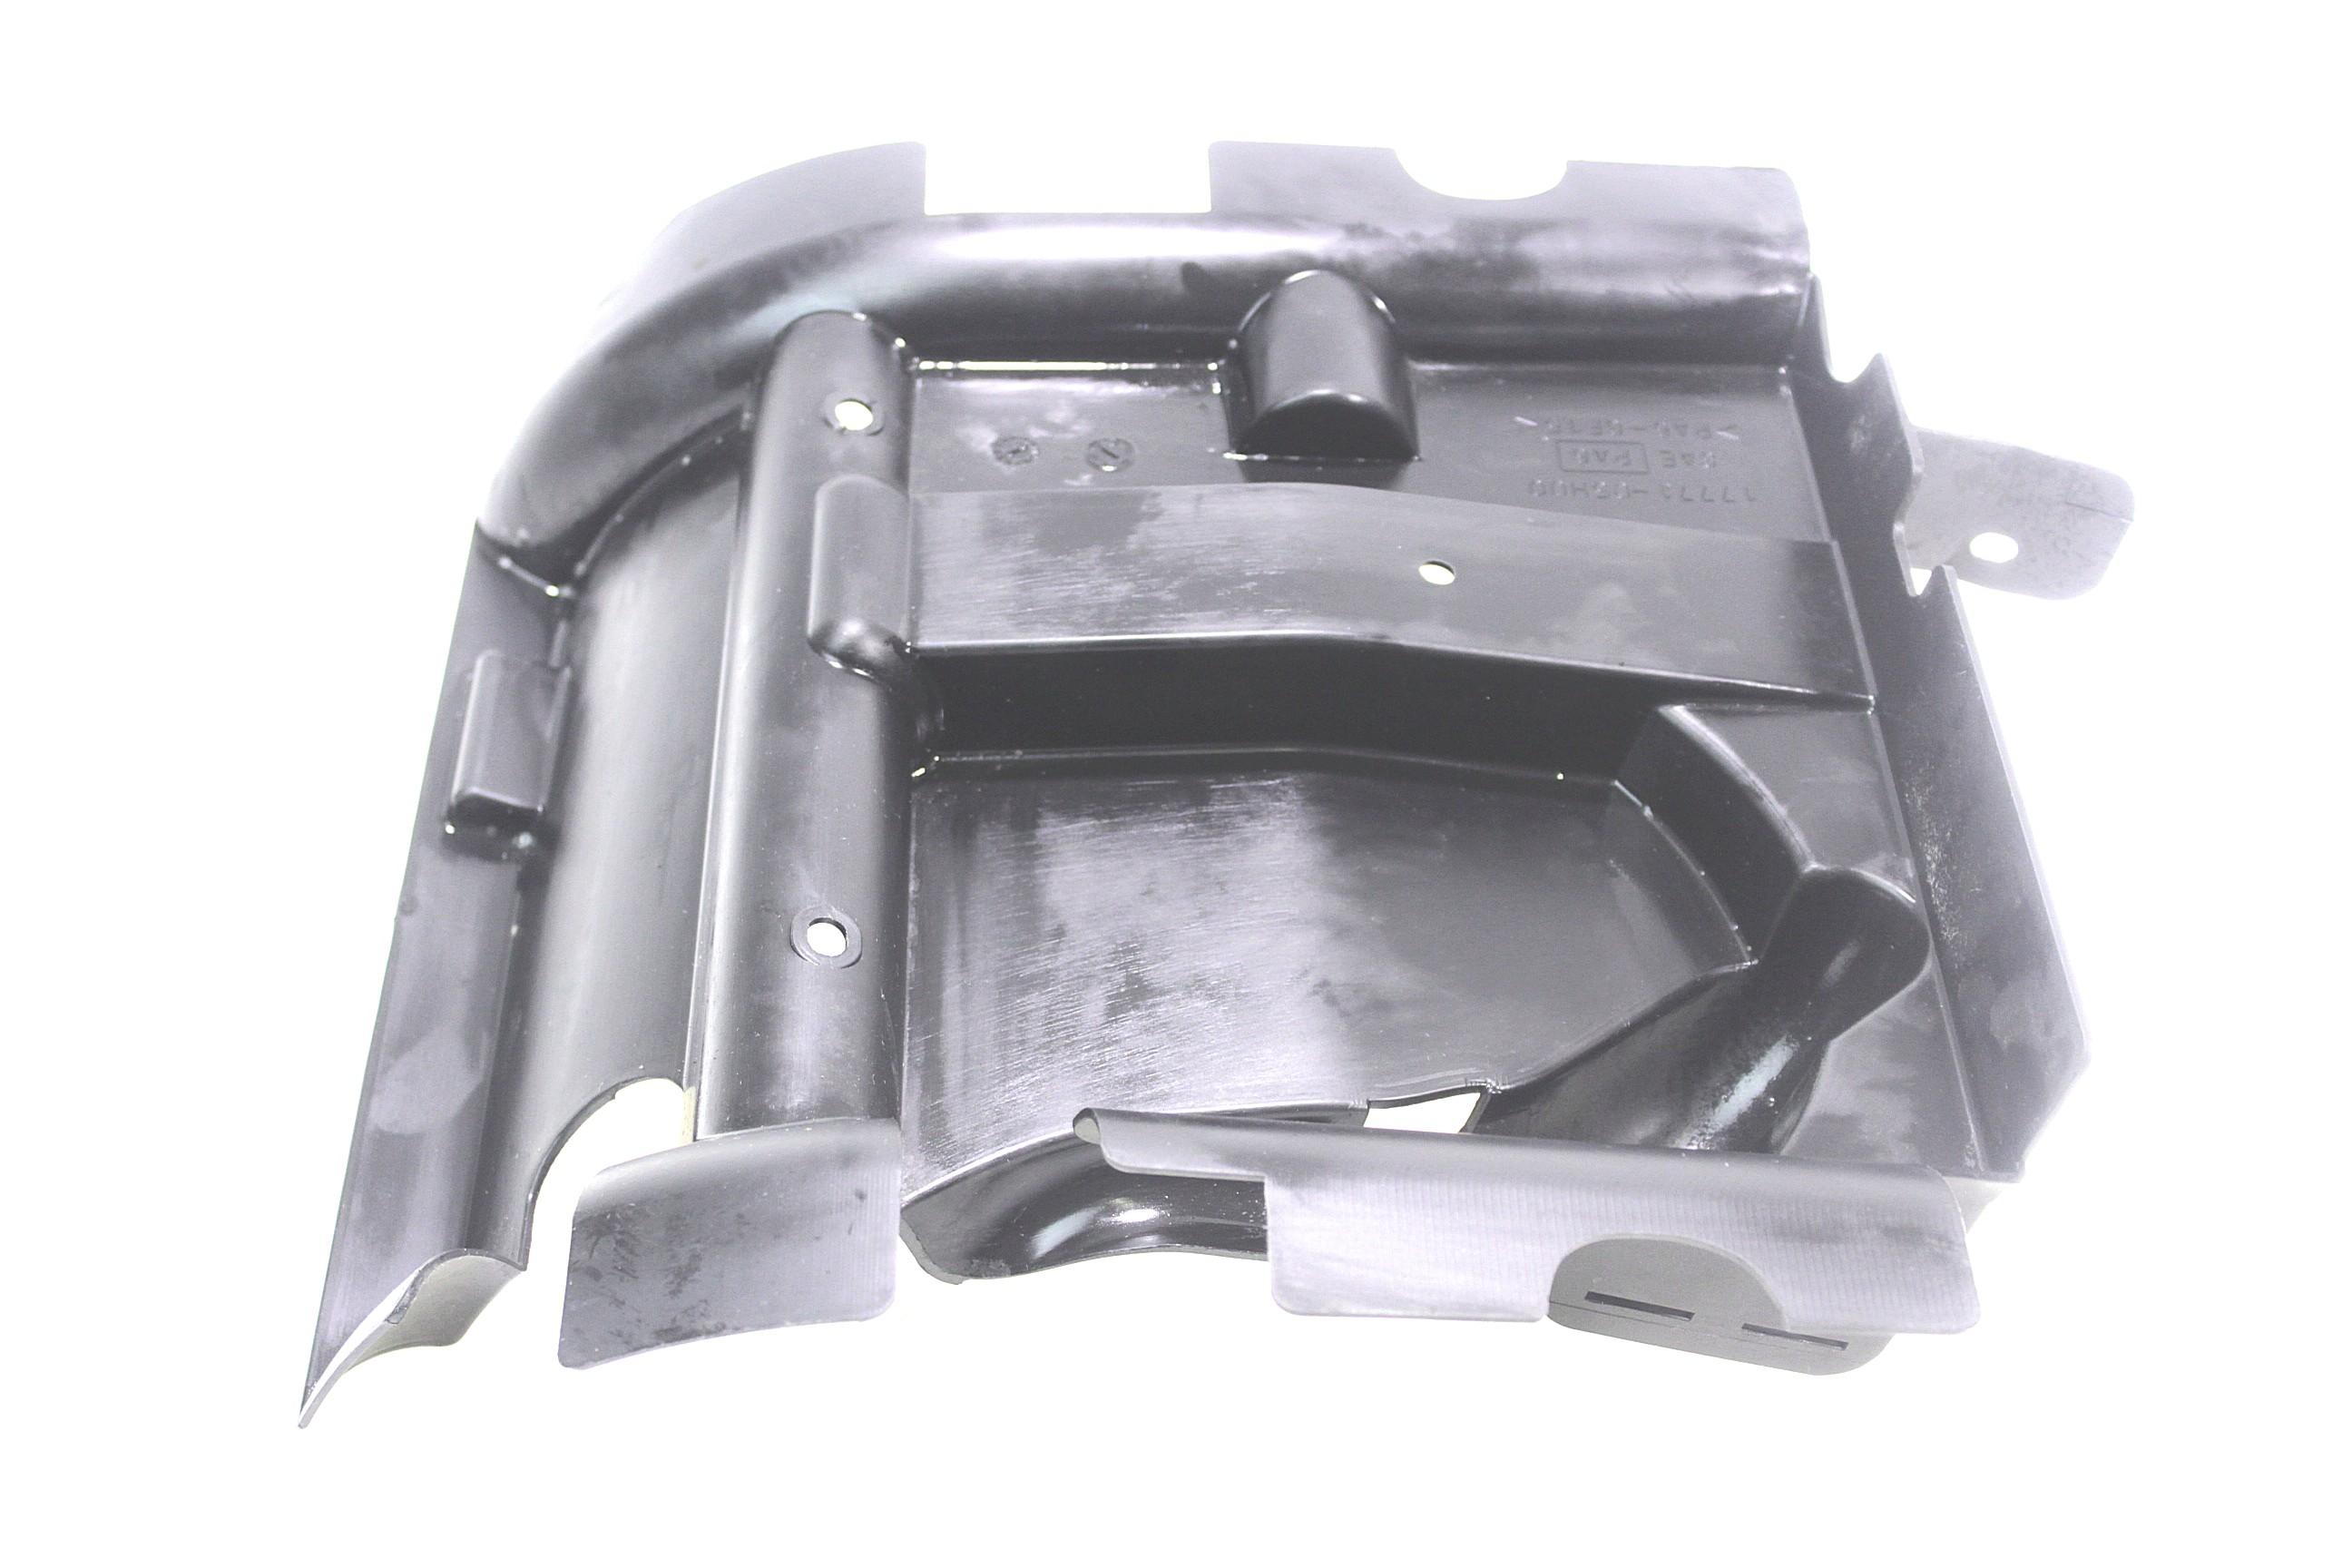 Gold /& Silber 4 PC-Auto-Motorrad-Reifen Messingventil 90 Grad Extension Tube Metallventilverl/ängerung Rod Inflatable Nozzle Extension Tube